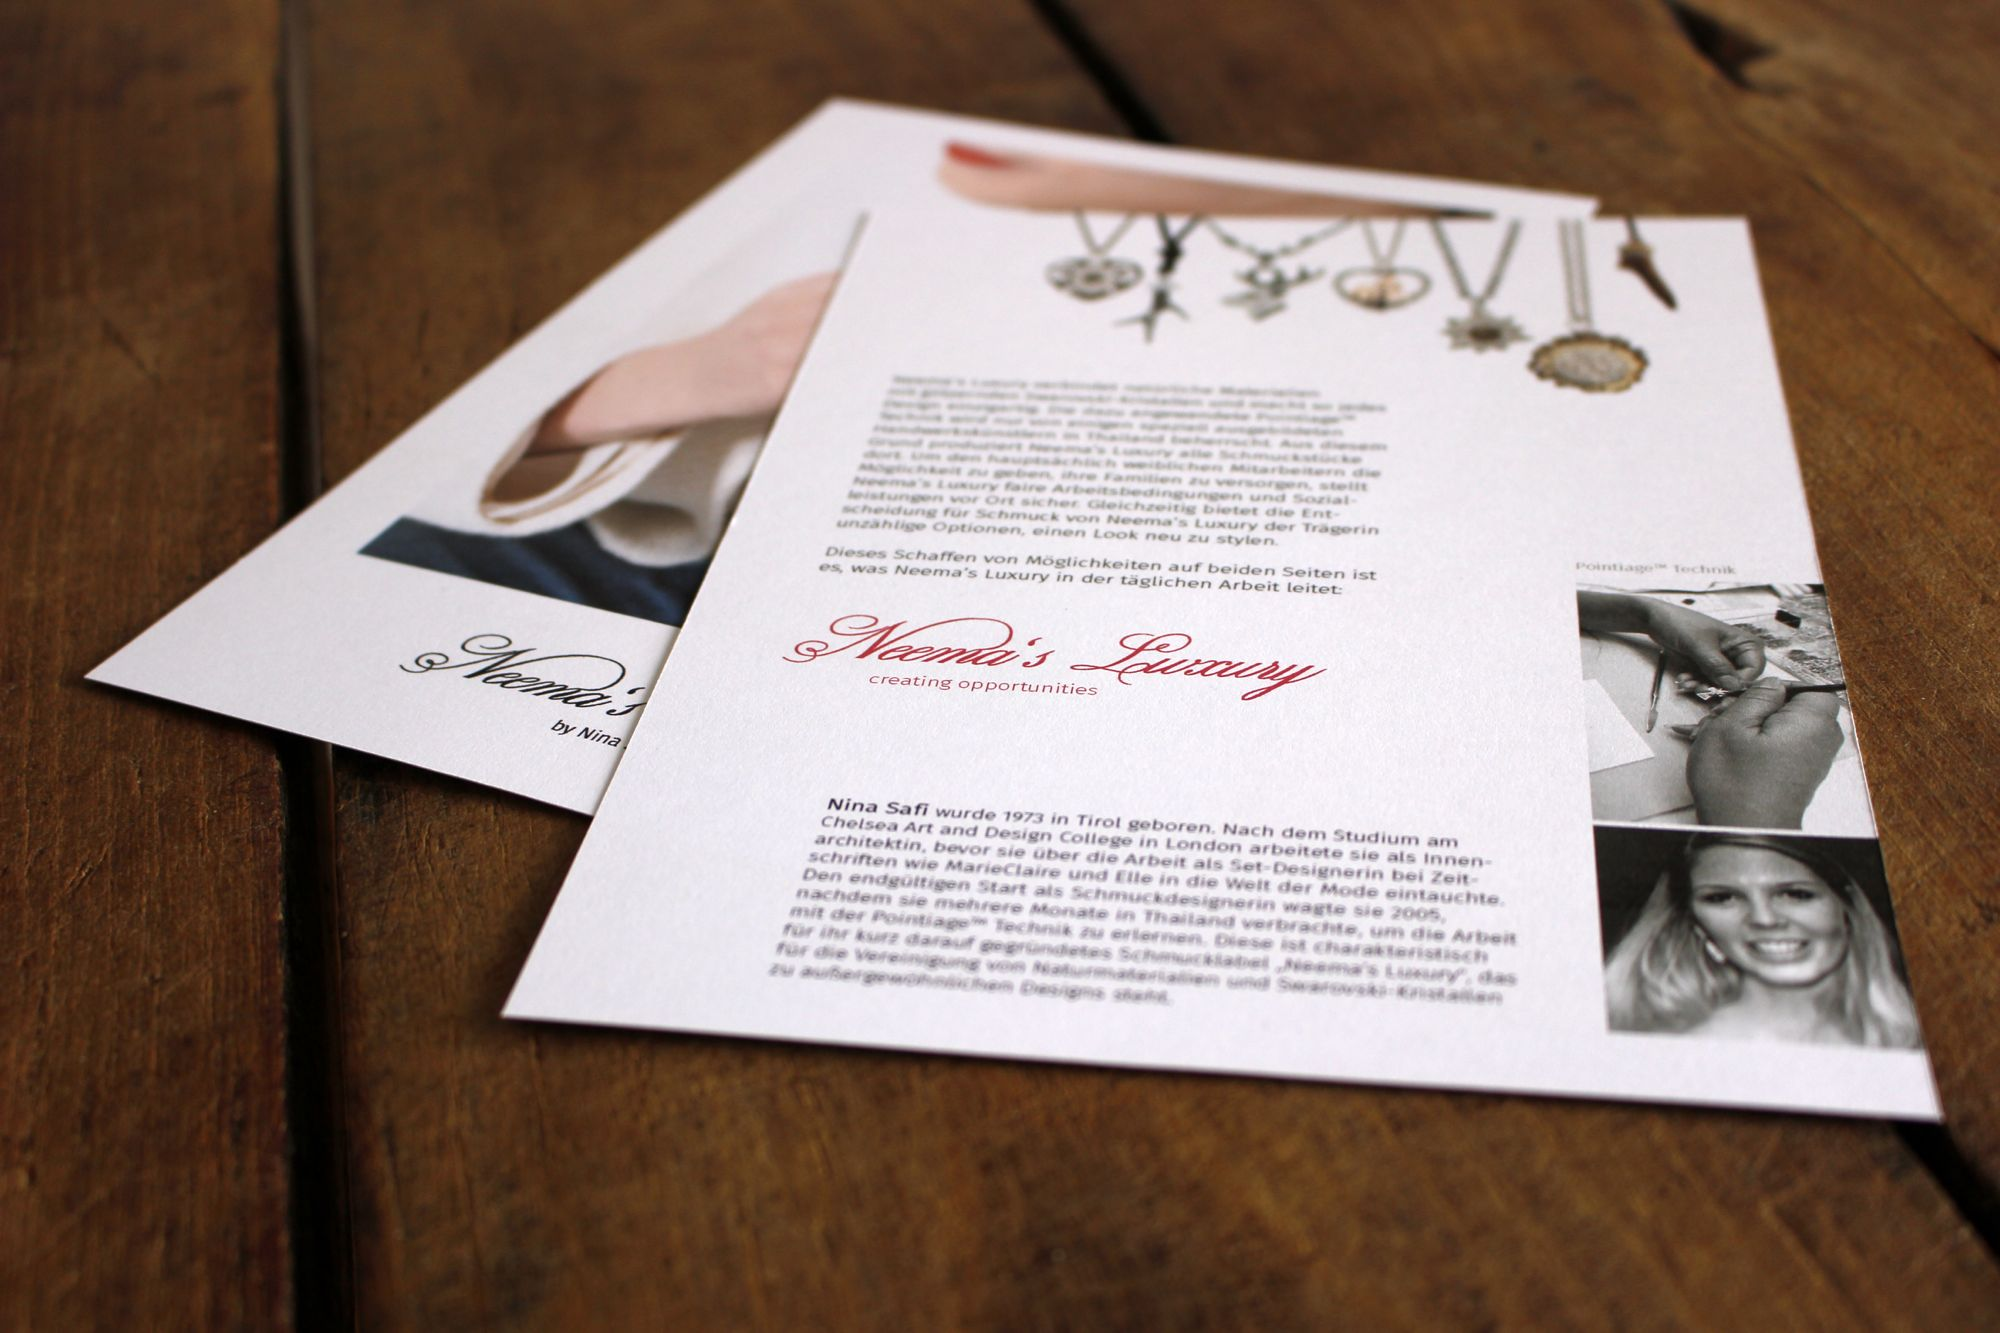 Corporate Design für Neema's Luxury